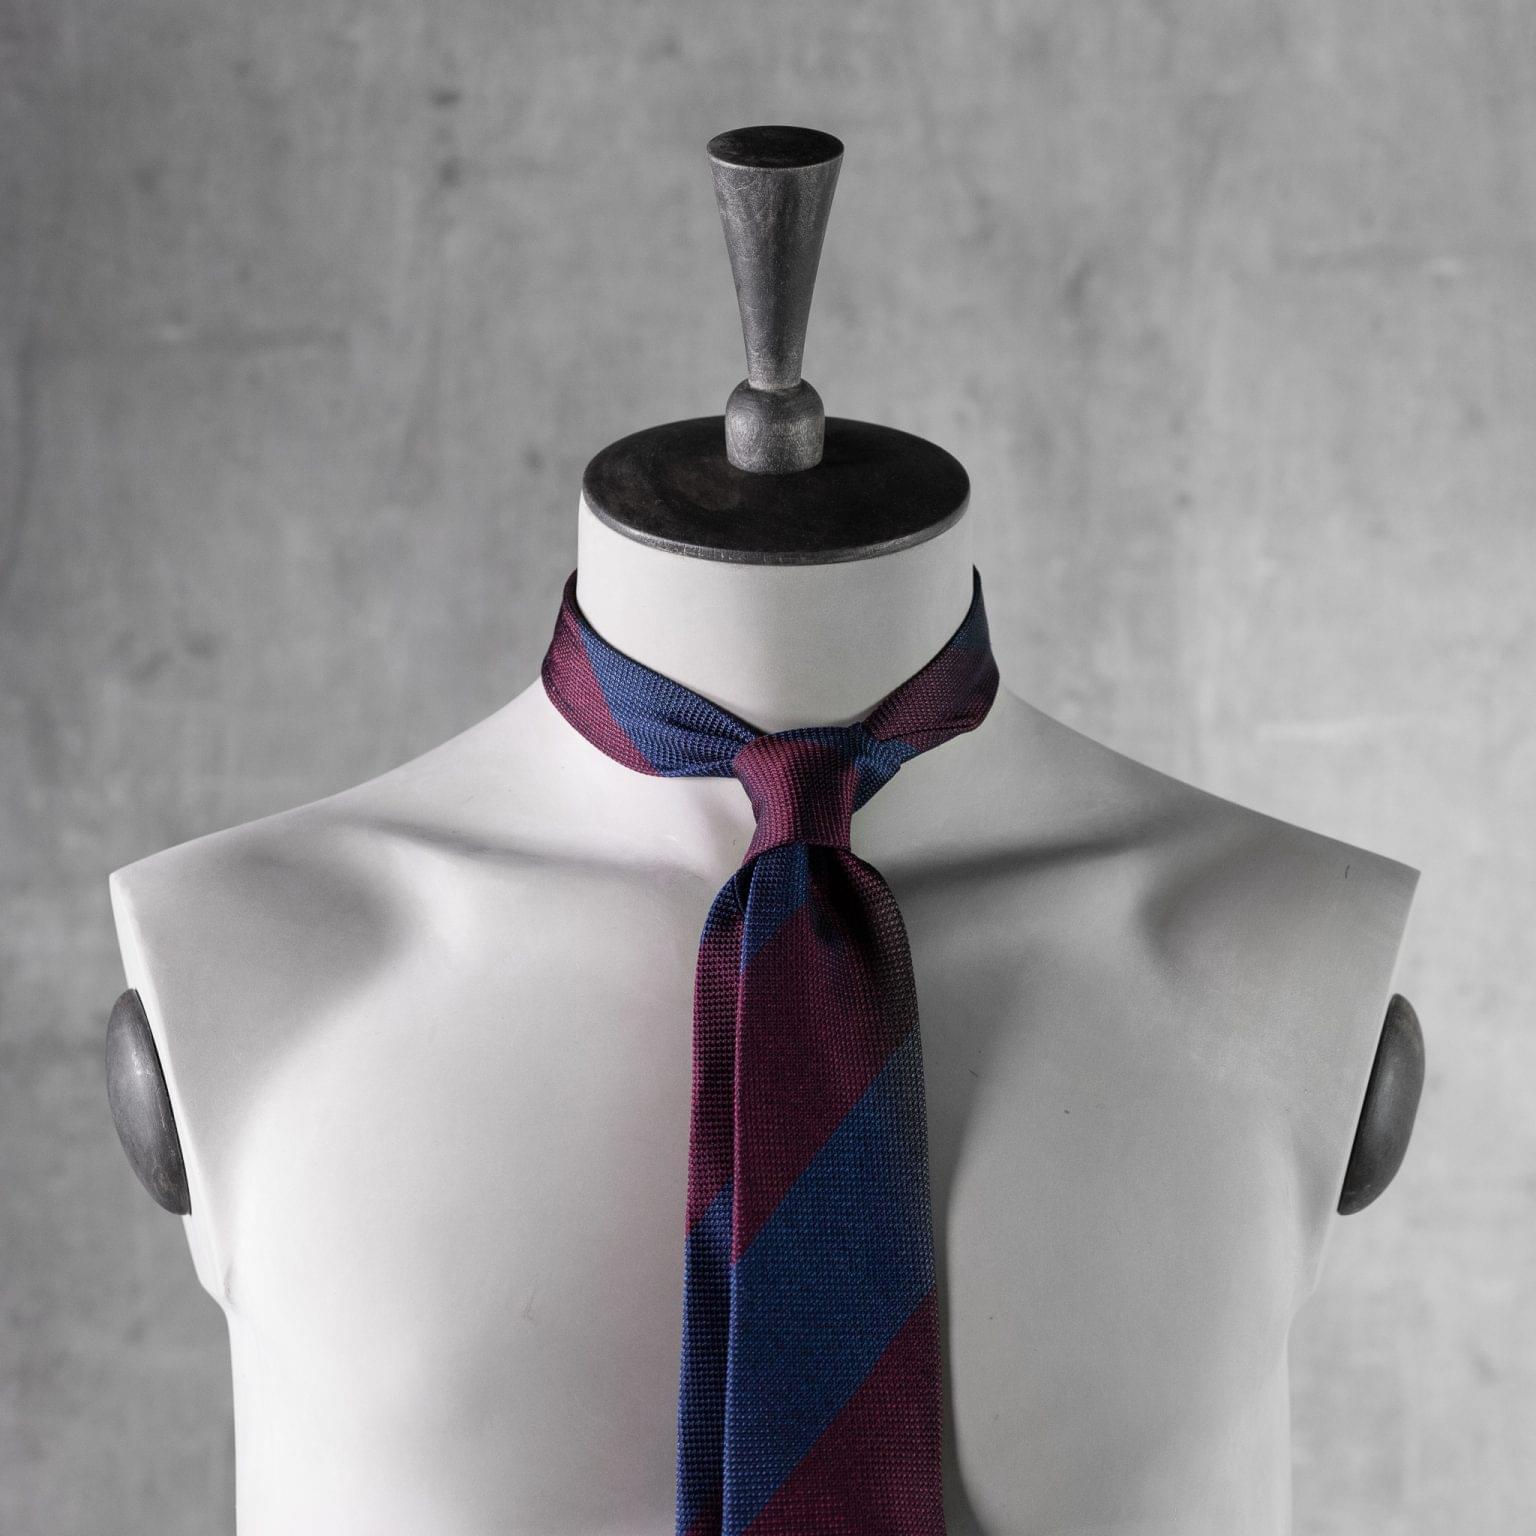 GRENADINE-0357-Tie-Initials-Corbata-Iniciales-The-Seelk-3